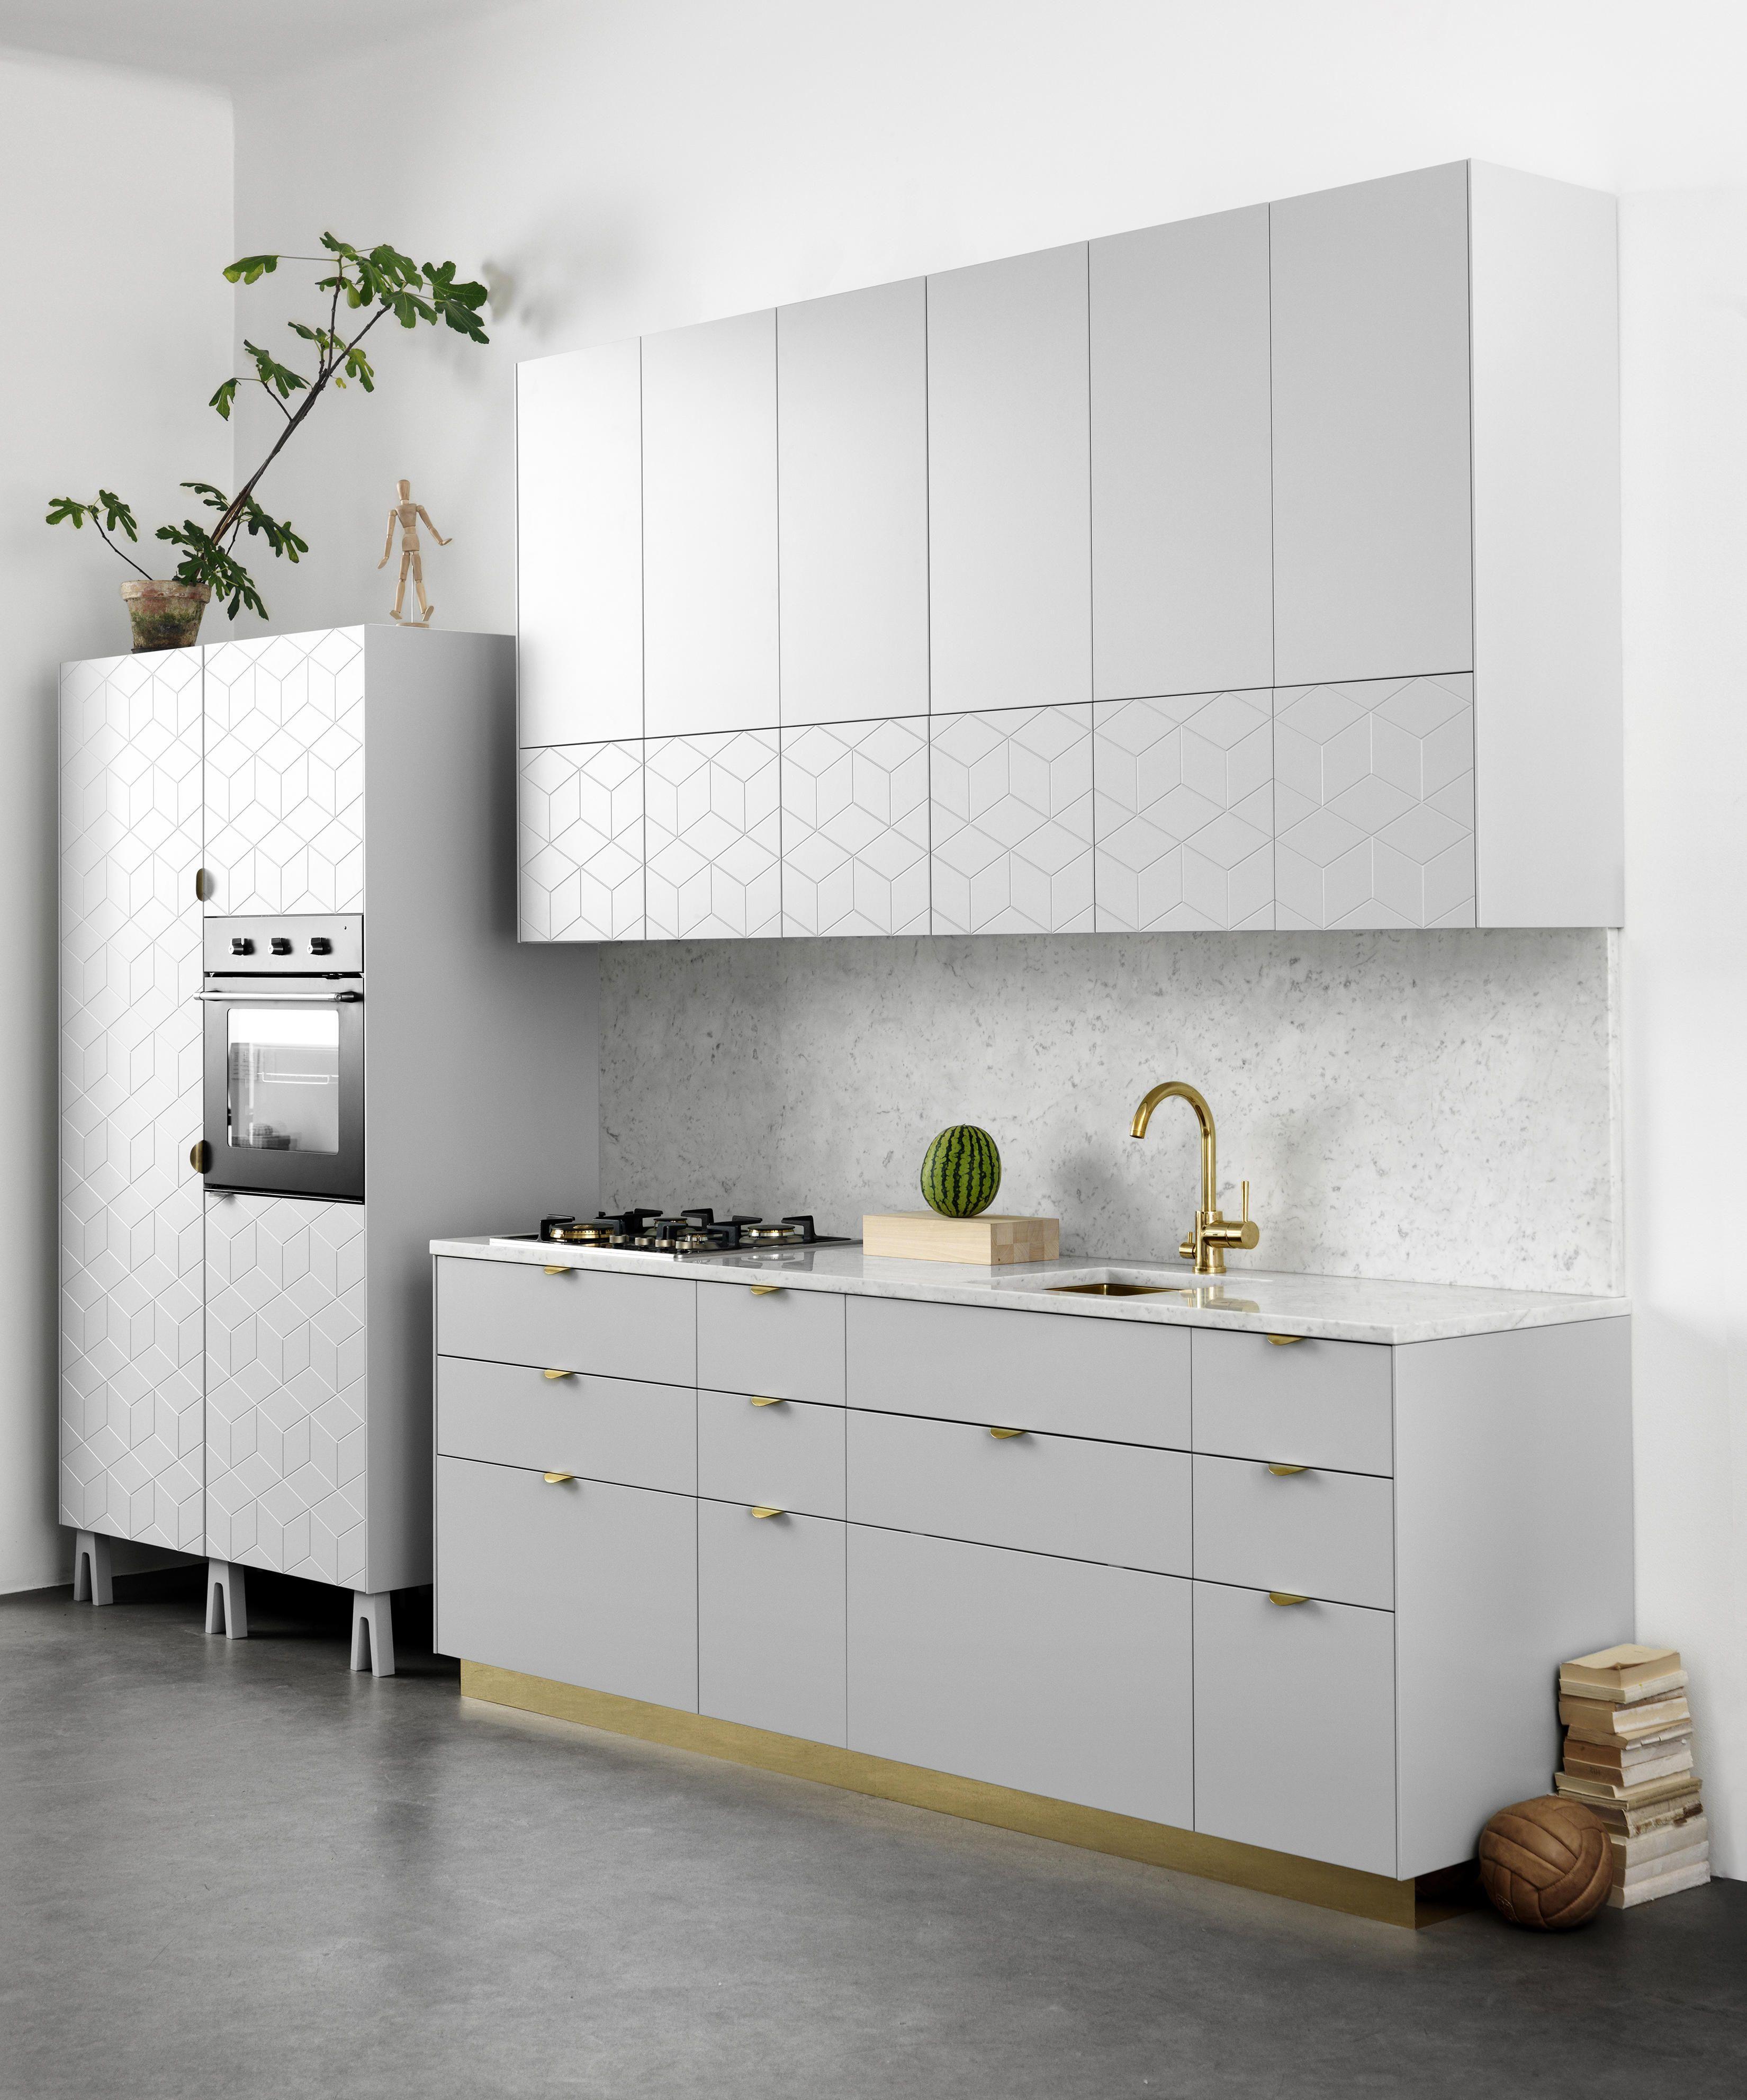 HomeIkea Ideas On For Pin Design New Kitchen By Su Lyn tshdCQrx